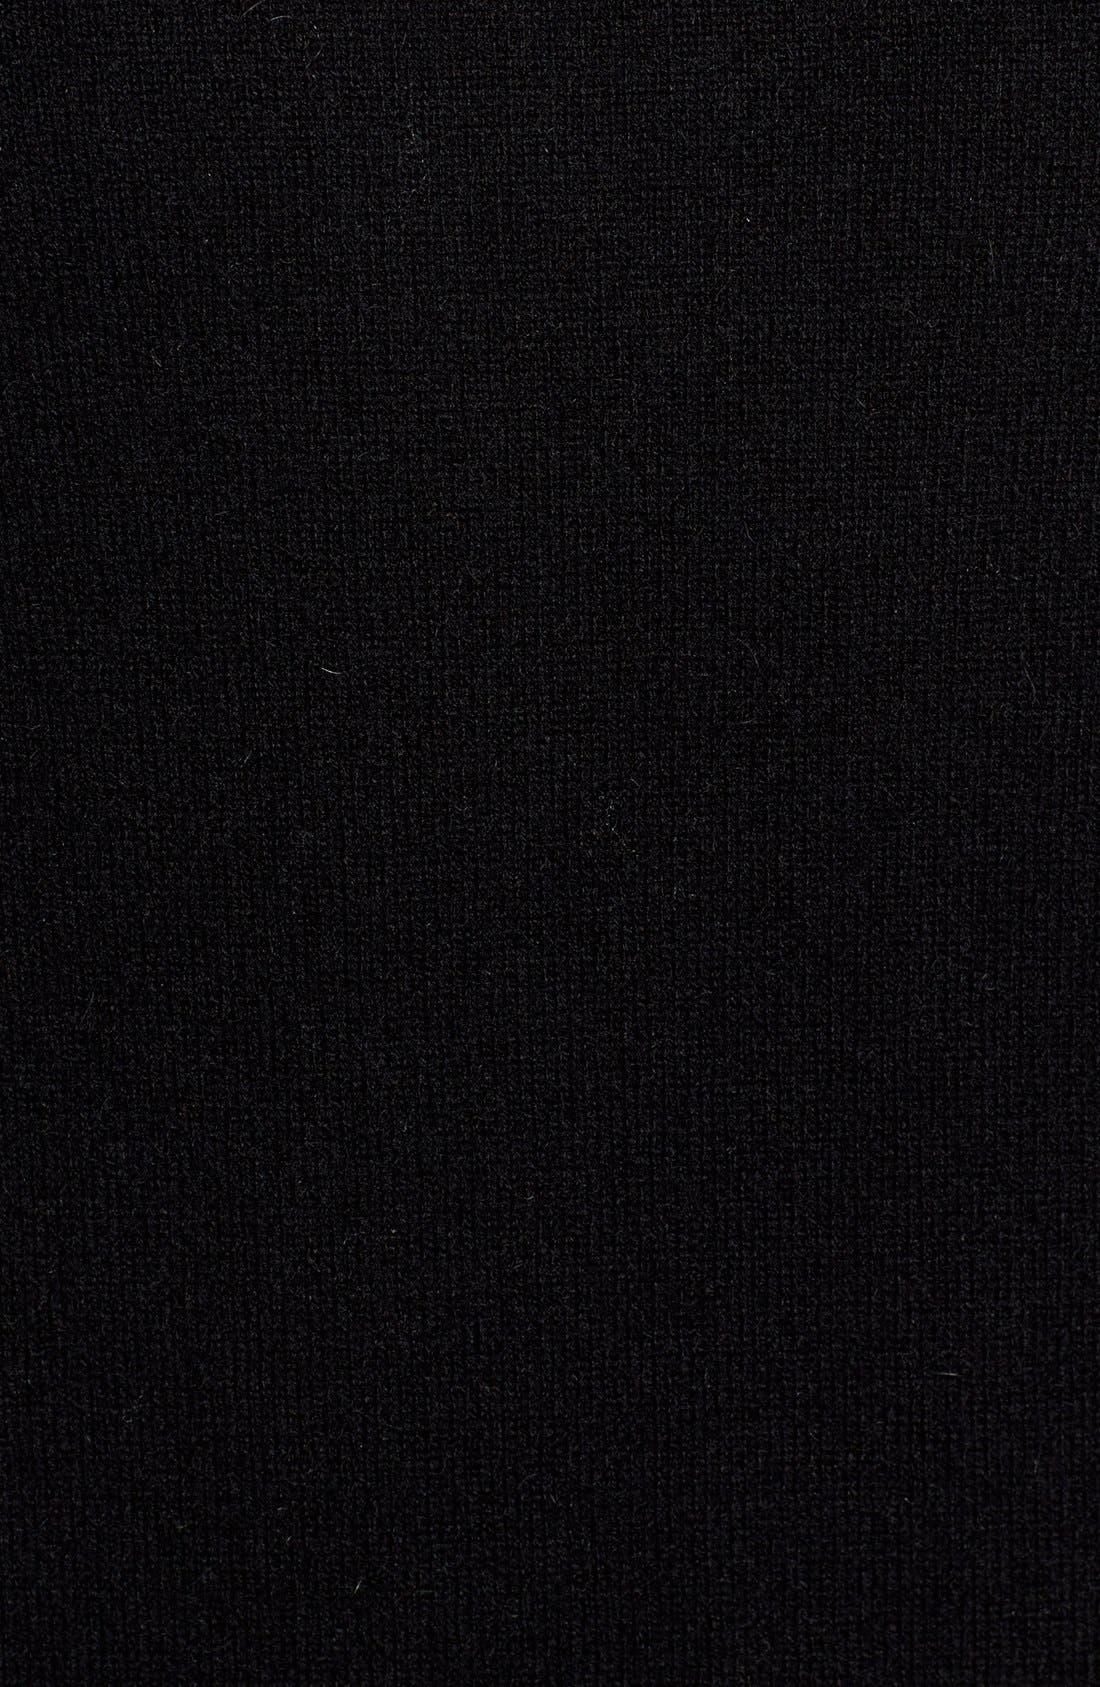 Cashmere Crewneck Sweater,                             Alternate thumbnail 5, color,                             BLACK CAVIAR